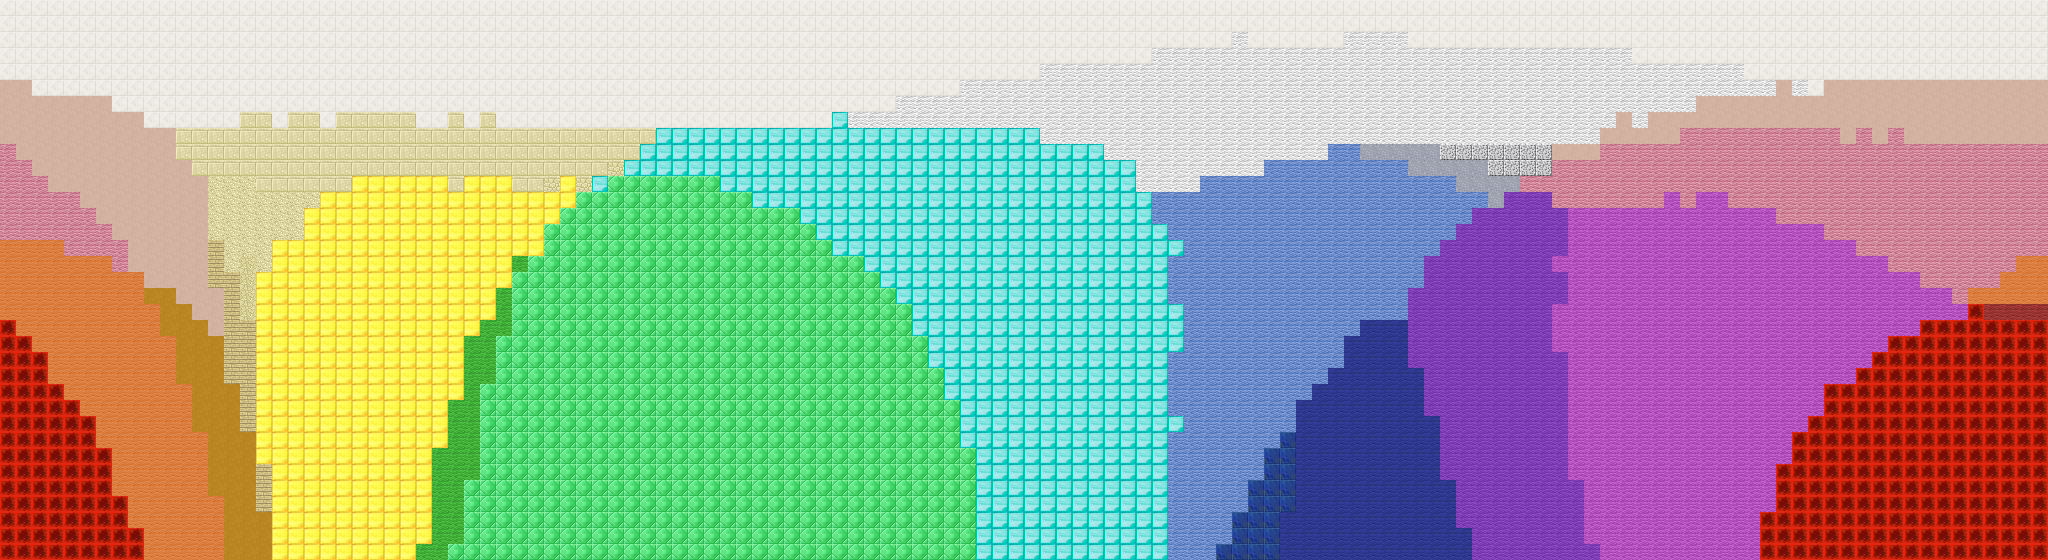 minecraft_dot (5).png